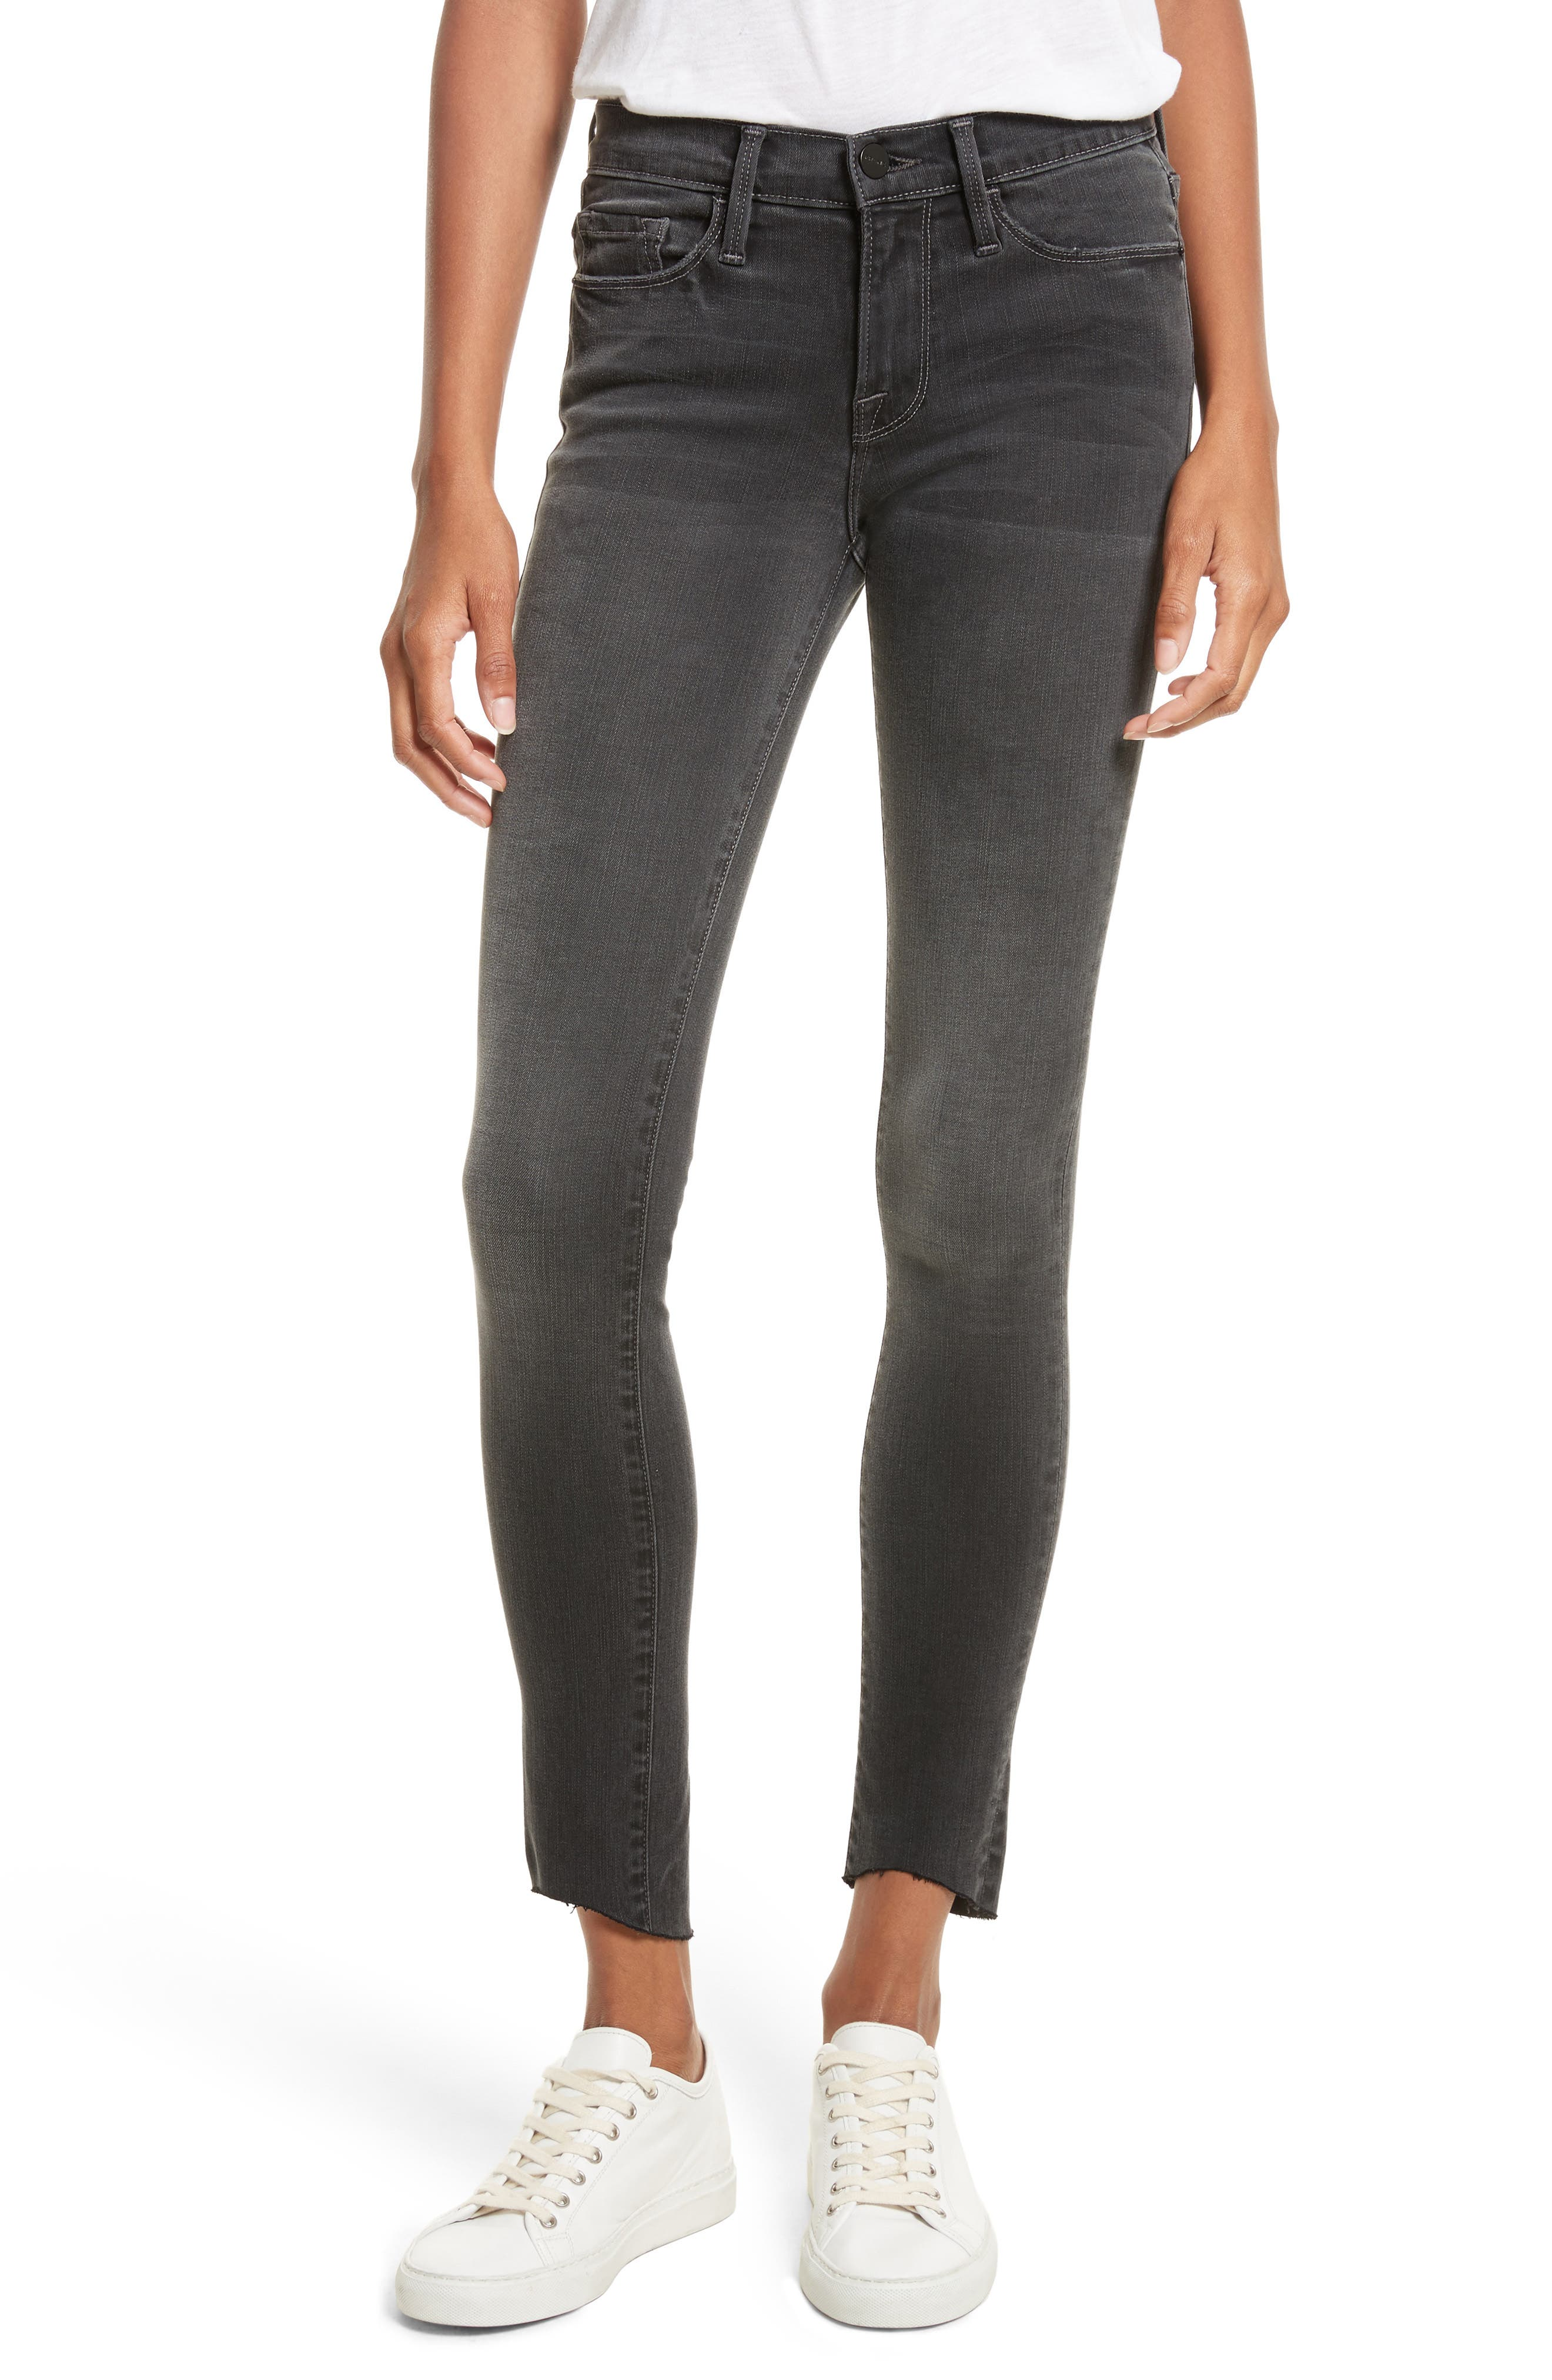 Alternate Image 1 Selected - FRAME Le Skinny de Jeanne Ankle Jeans (Harlow)